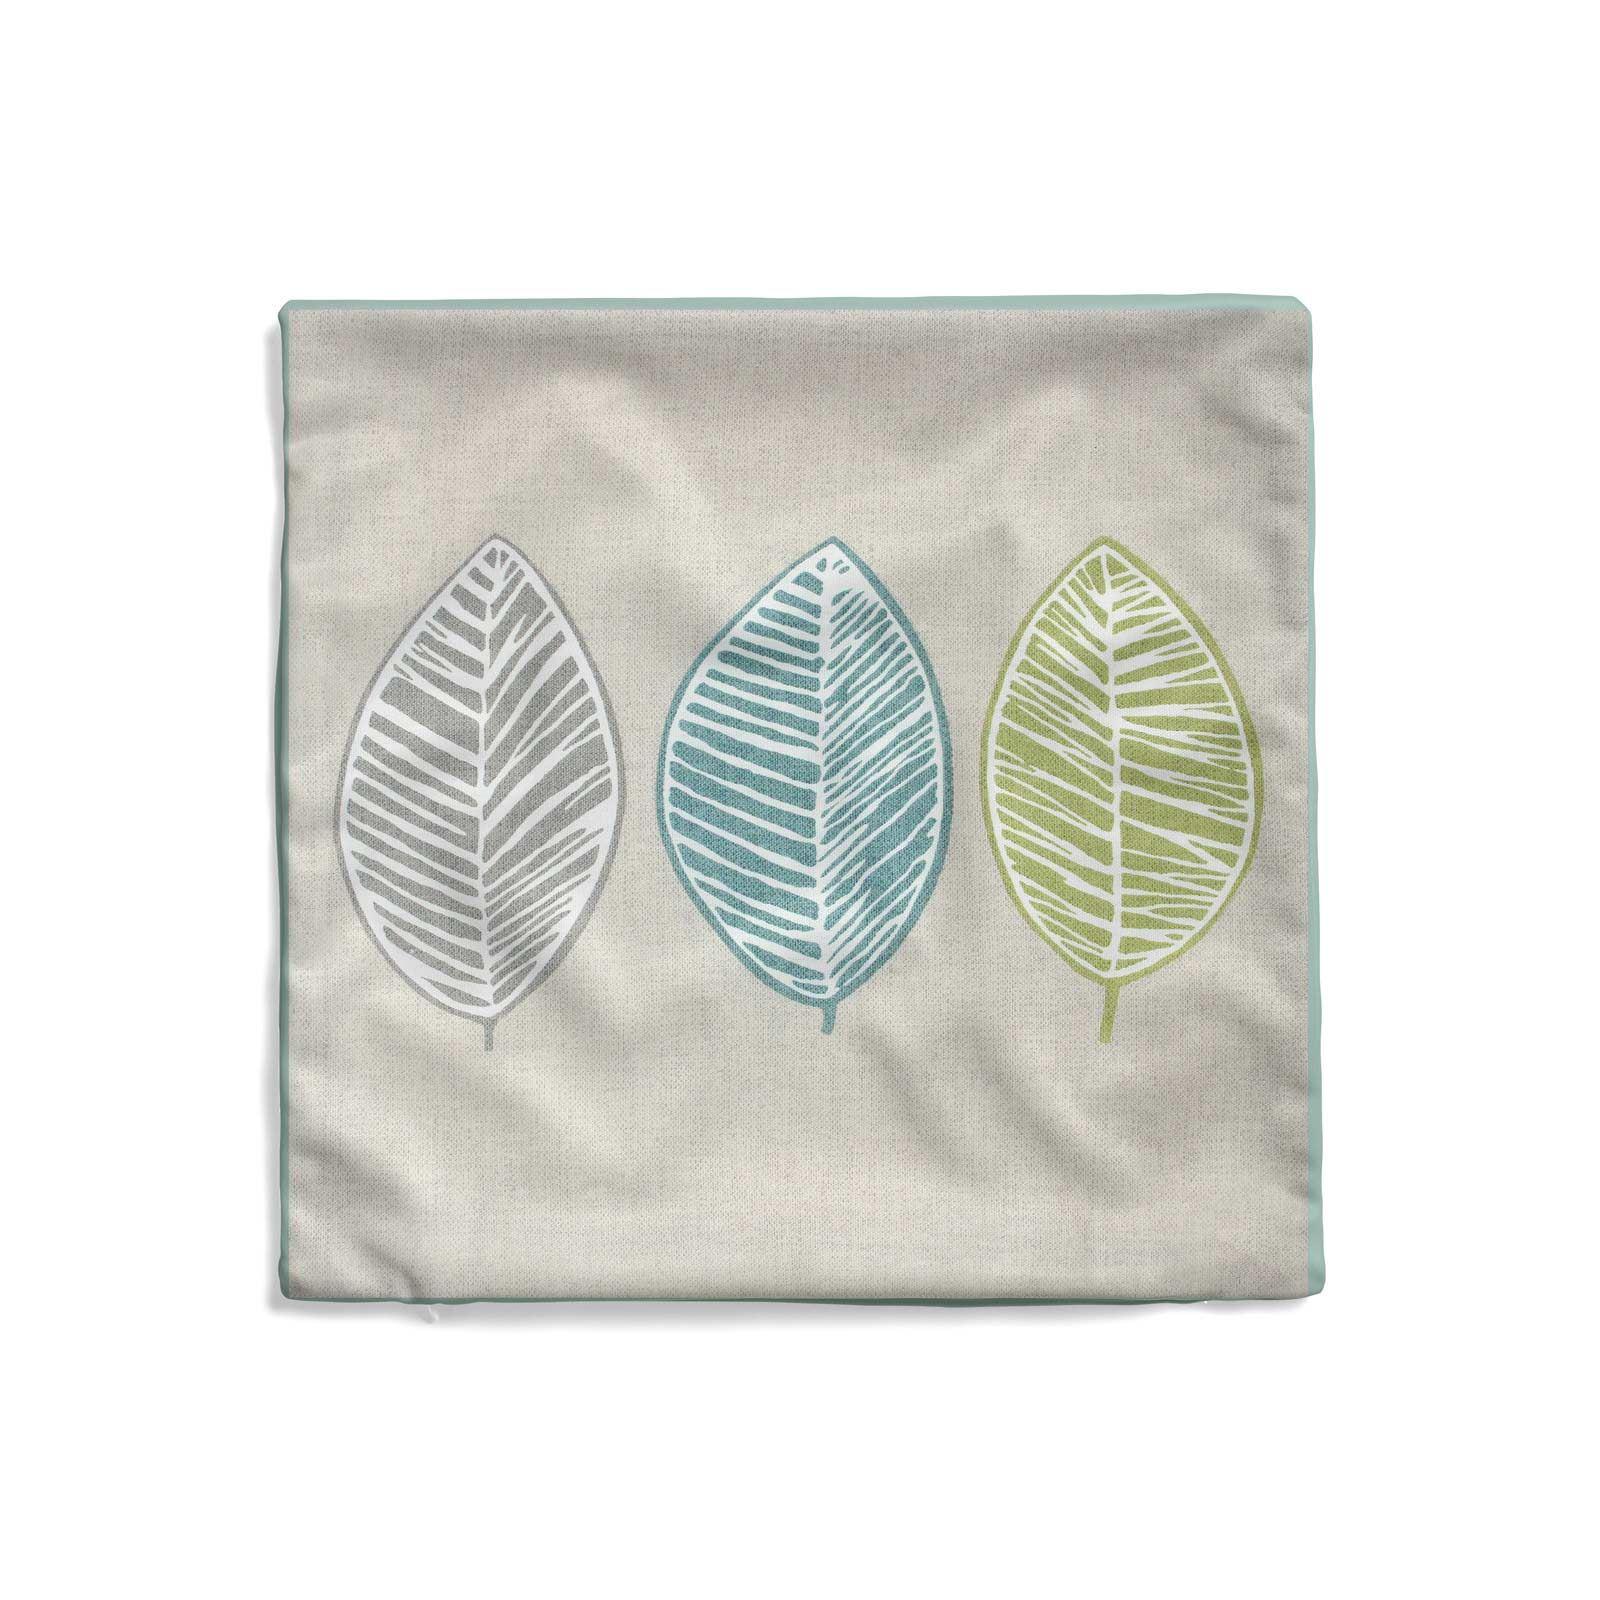 Teal-Blue-Duck-Egg-Cushion-Covers-18-034-x18-034-45cm-x-45cm-Luxury-Cover thumbnail 47